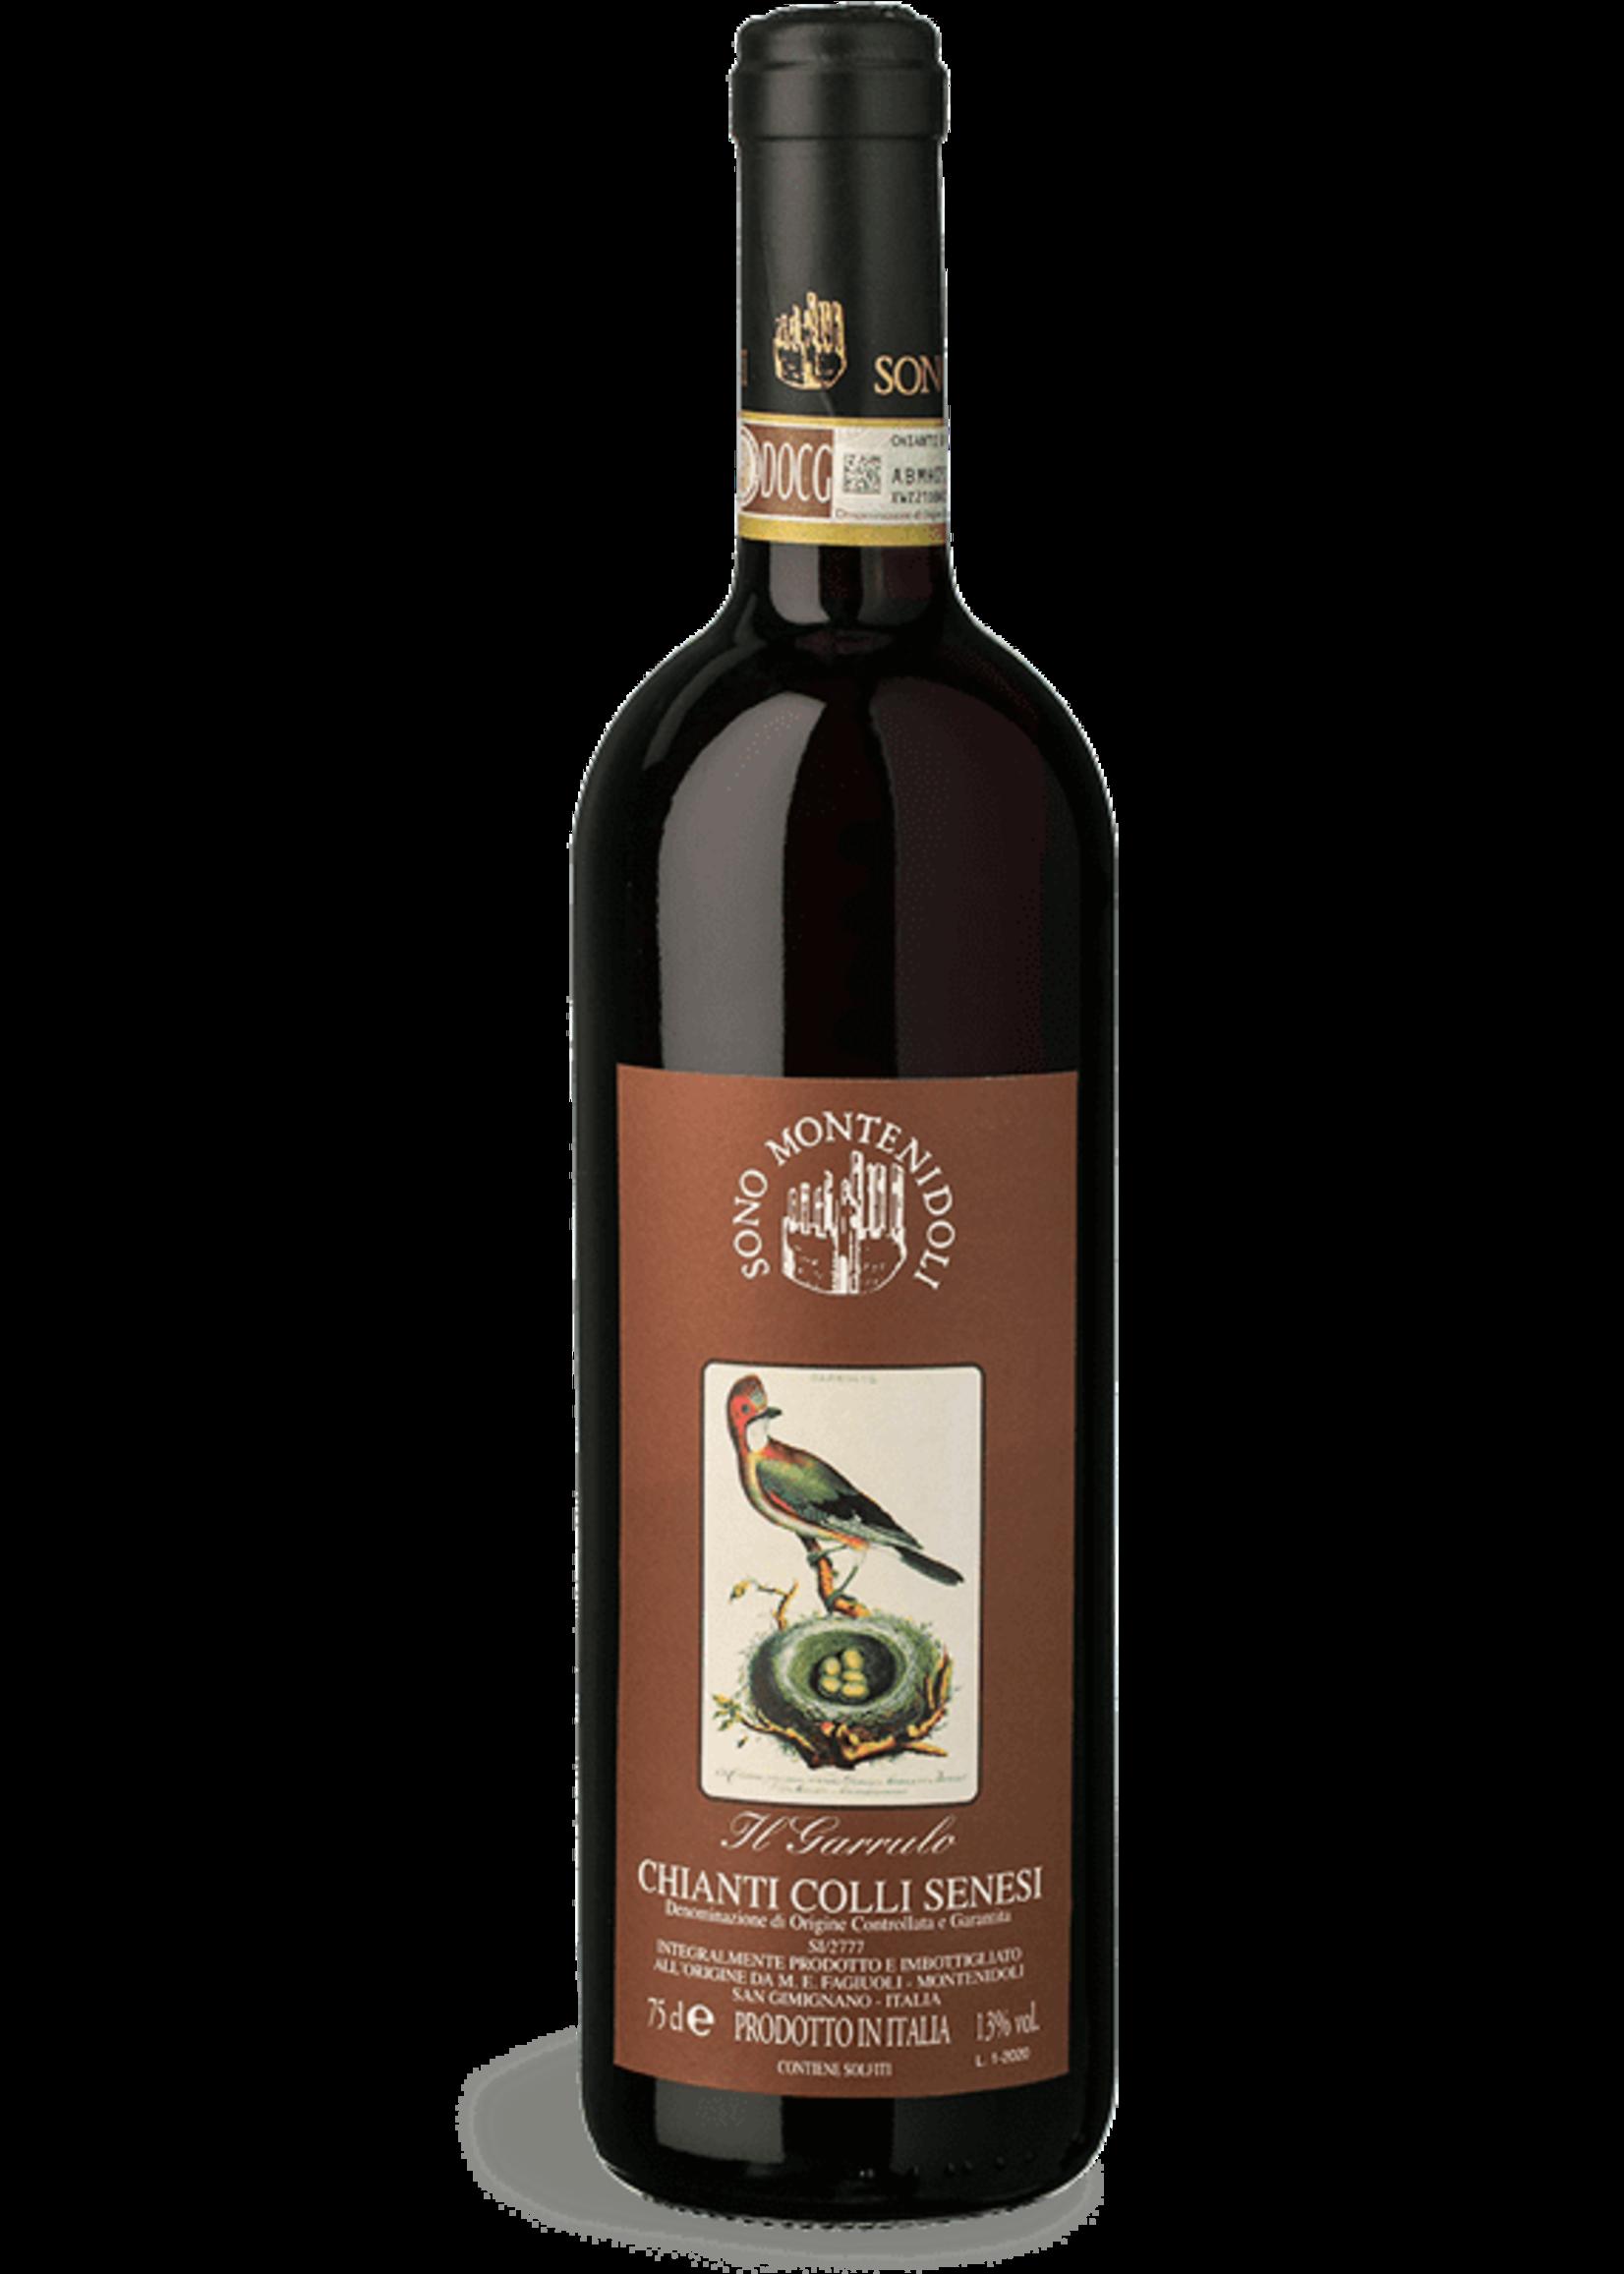 Montenidoli Chianti Colli Senesi